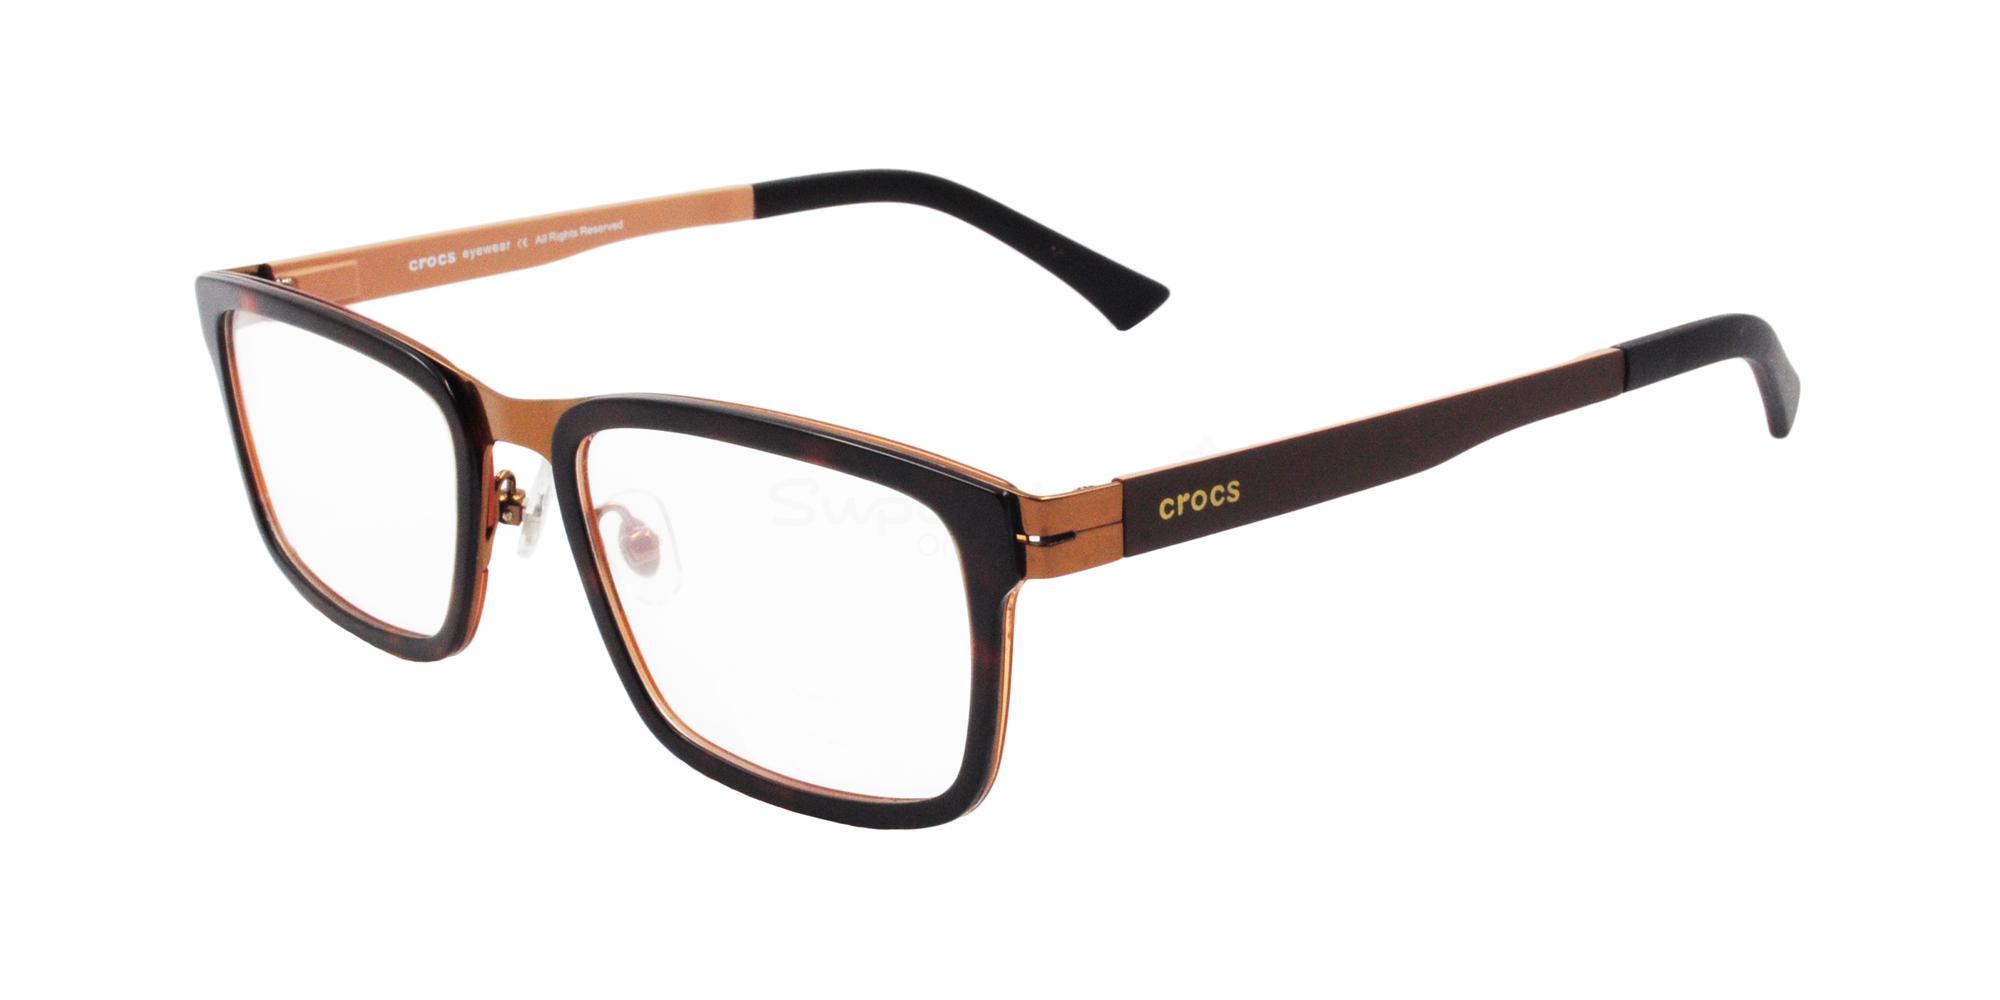 40BN CF4001 Glasses, Crocs Eyewear